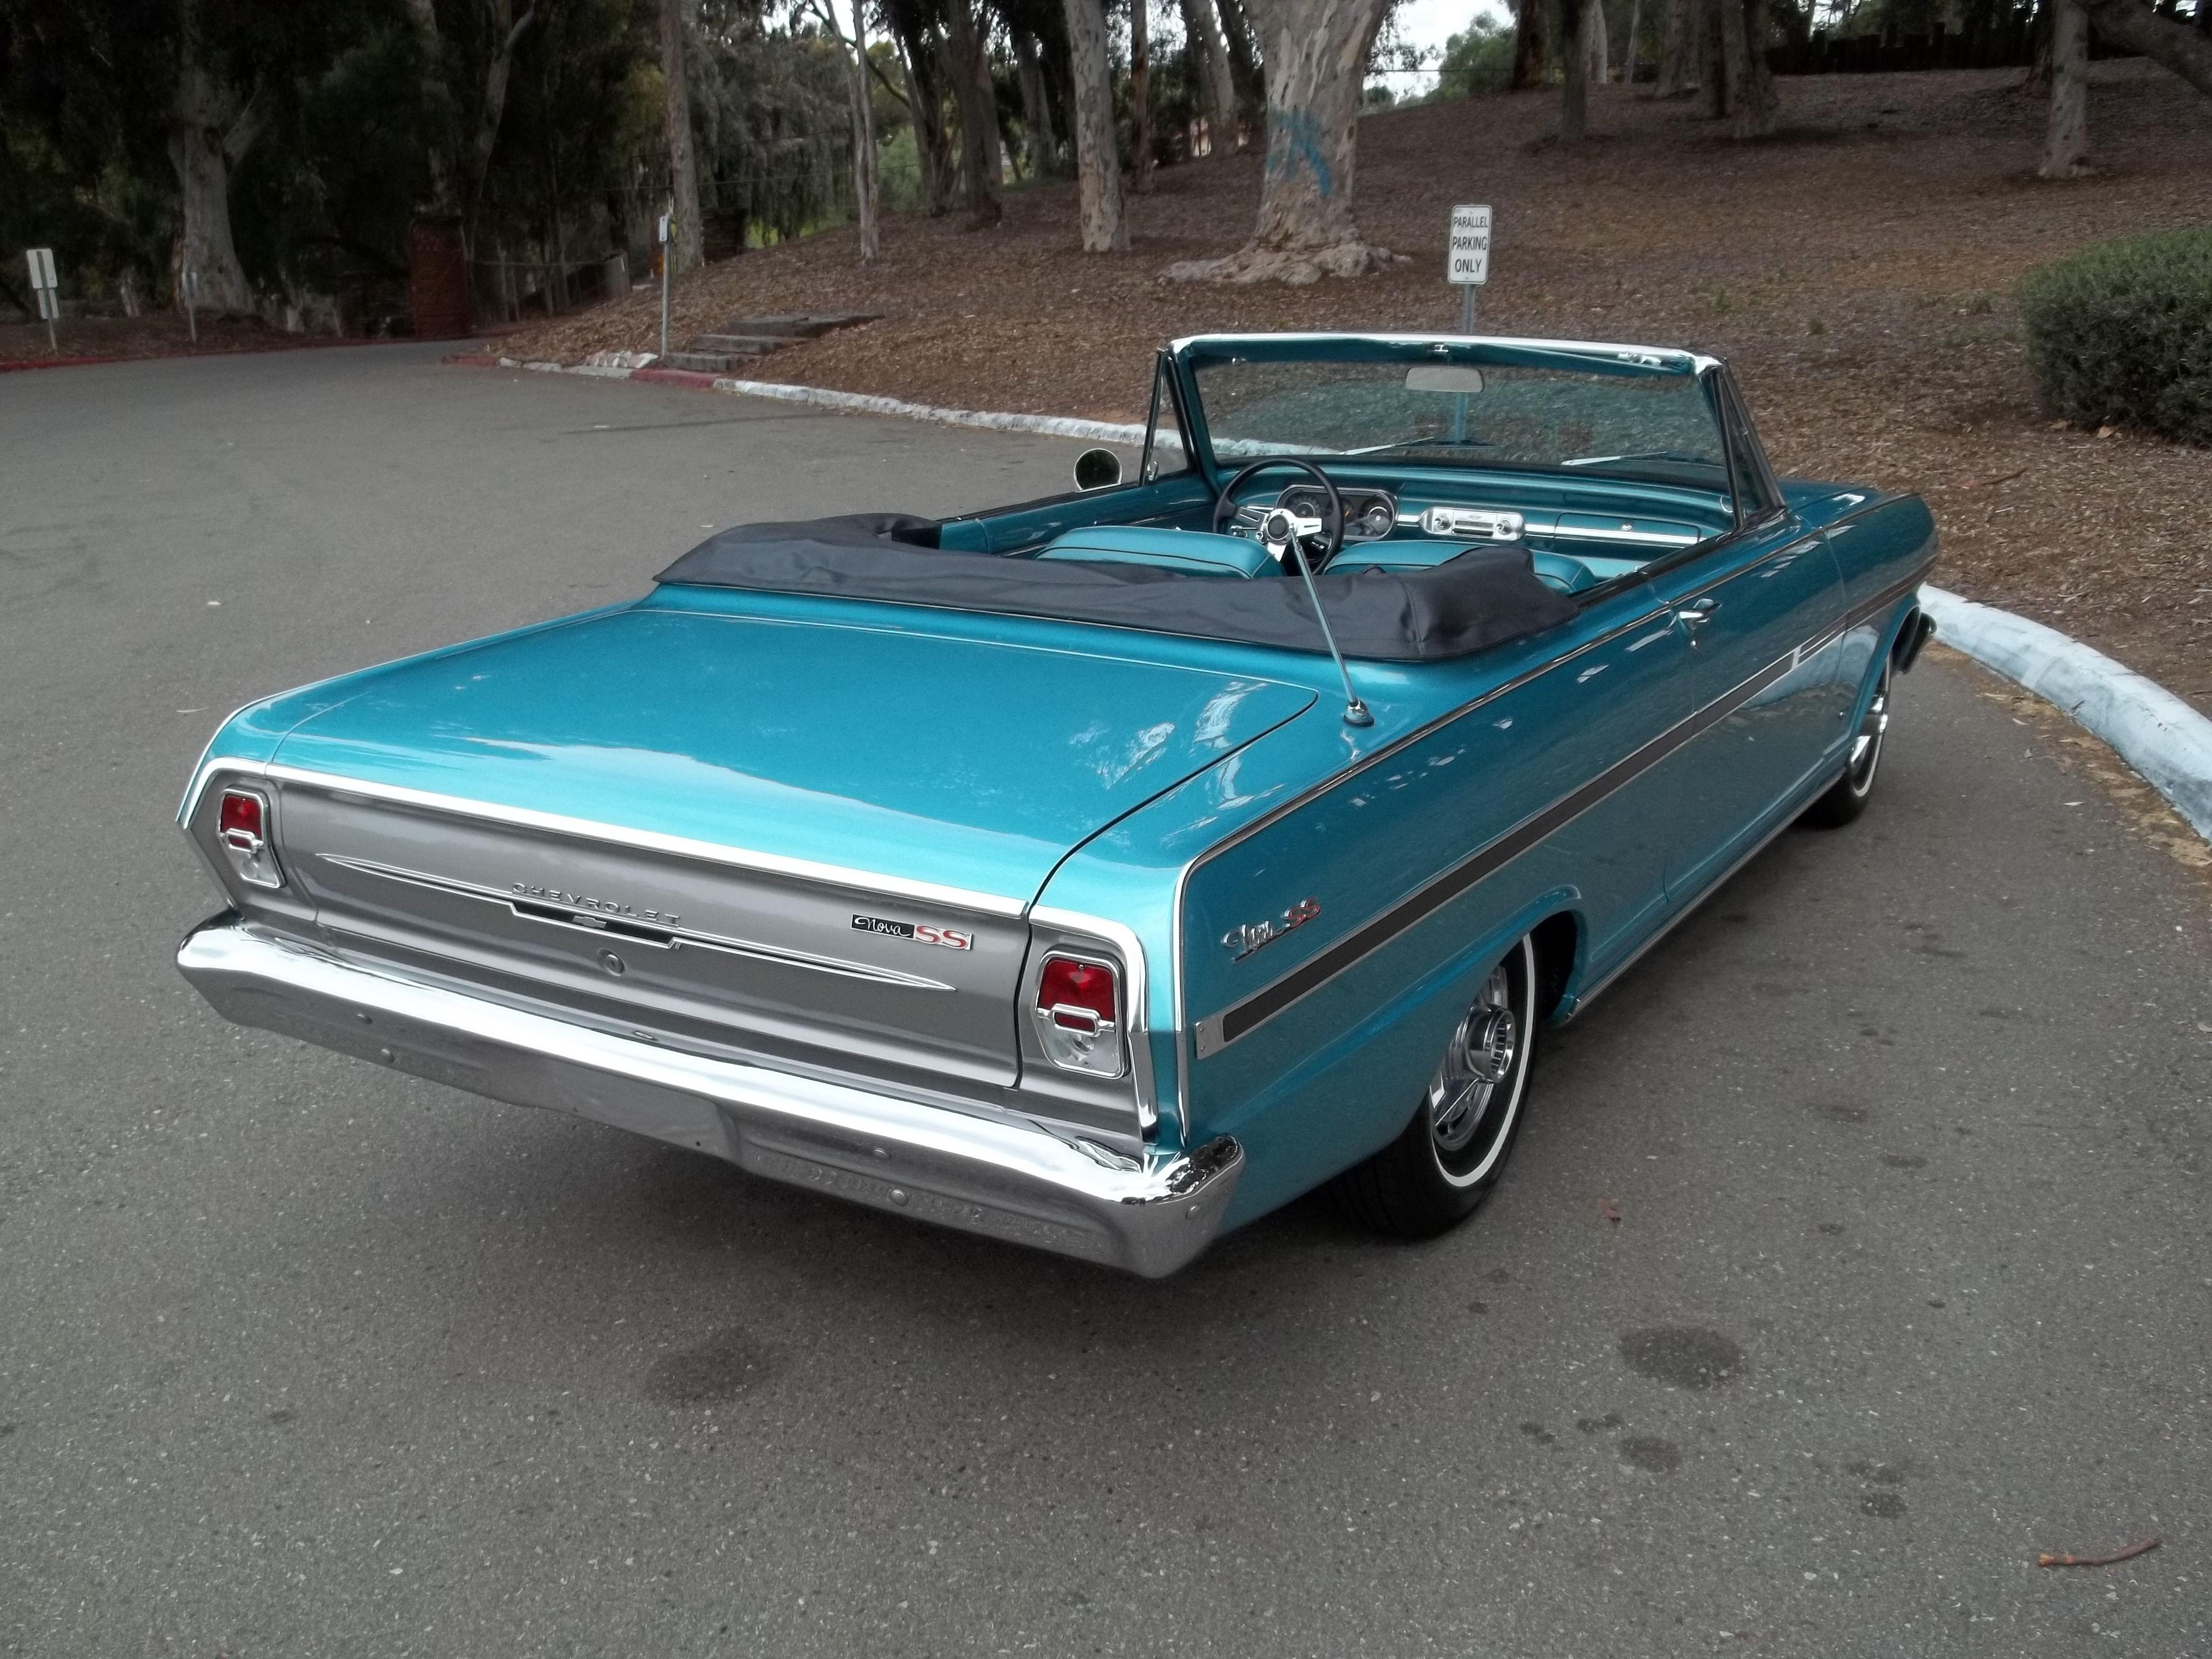 1965 chevy ii nova ss favorite cars american muscle pinterest - 1964 Chevy Nova Convertible